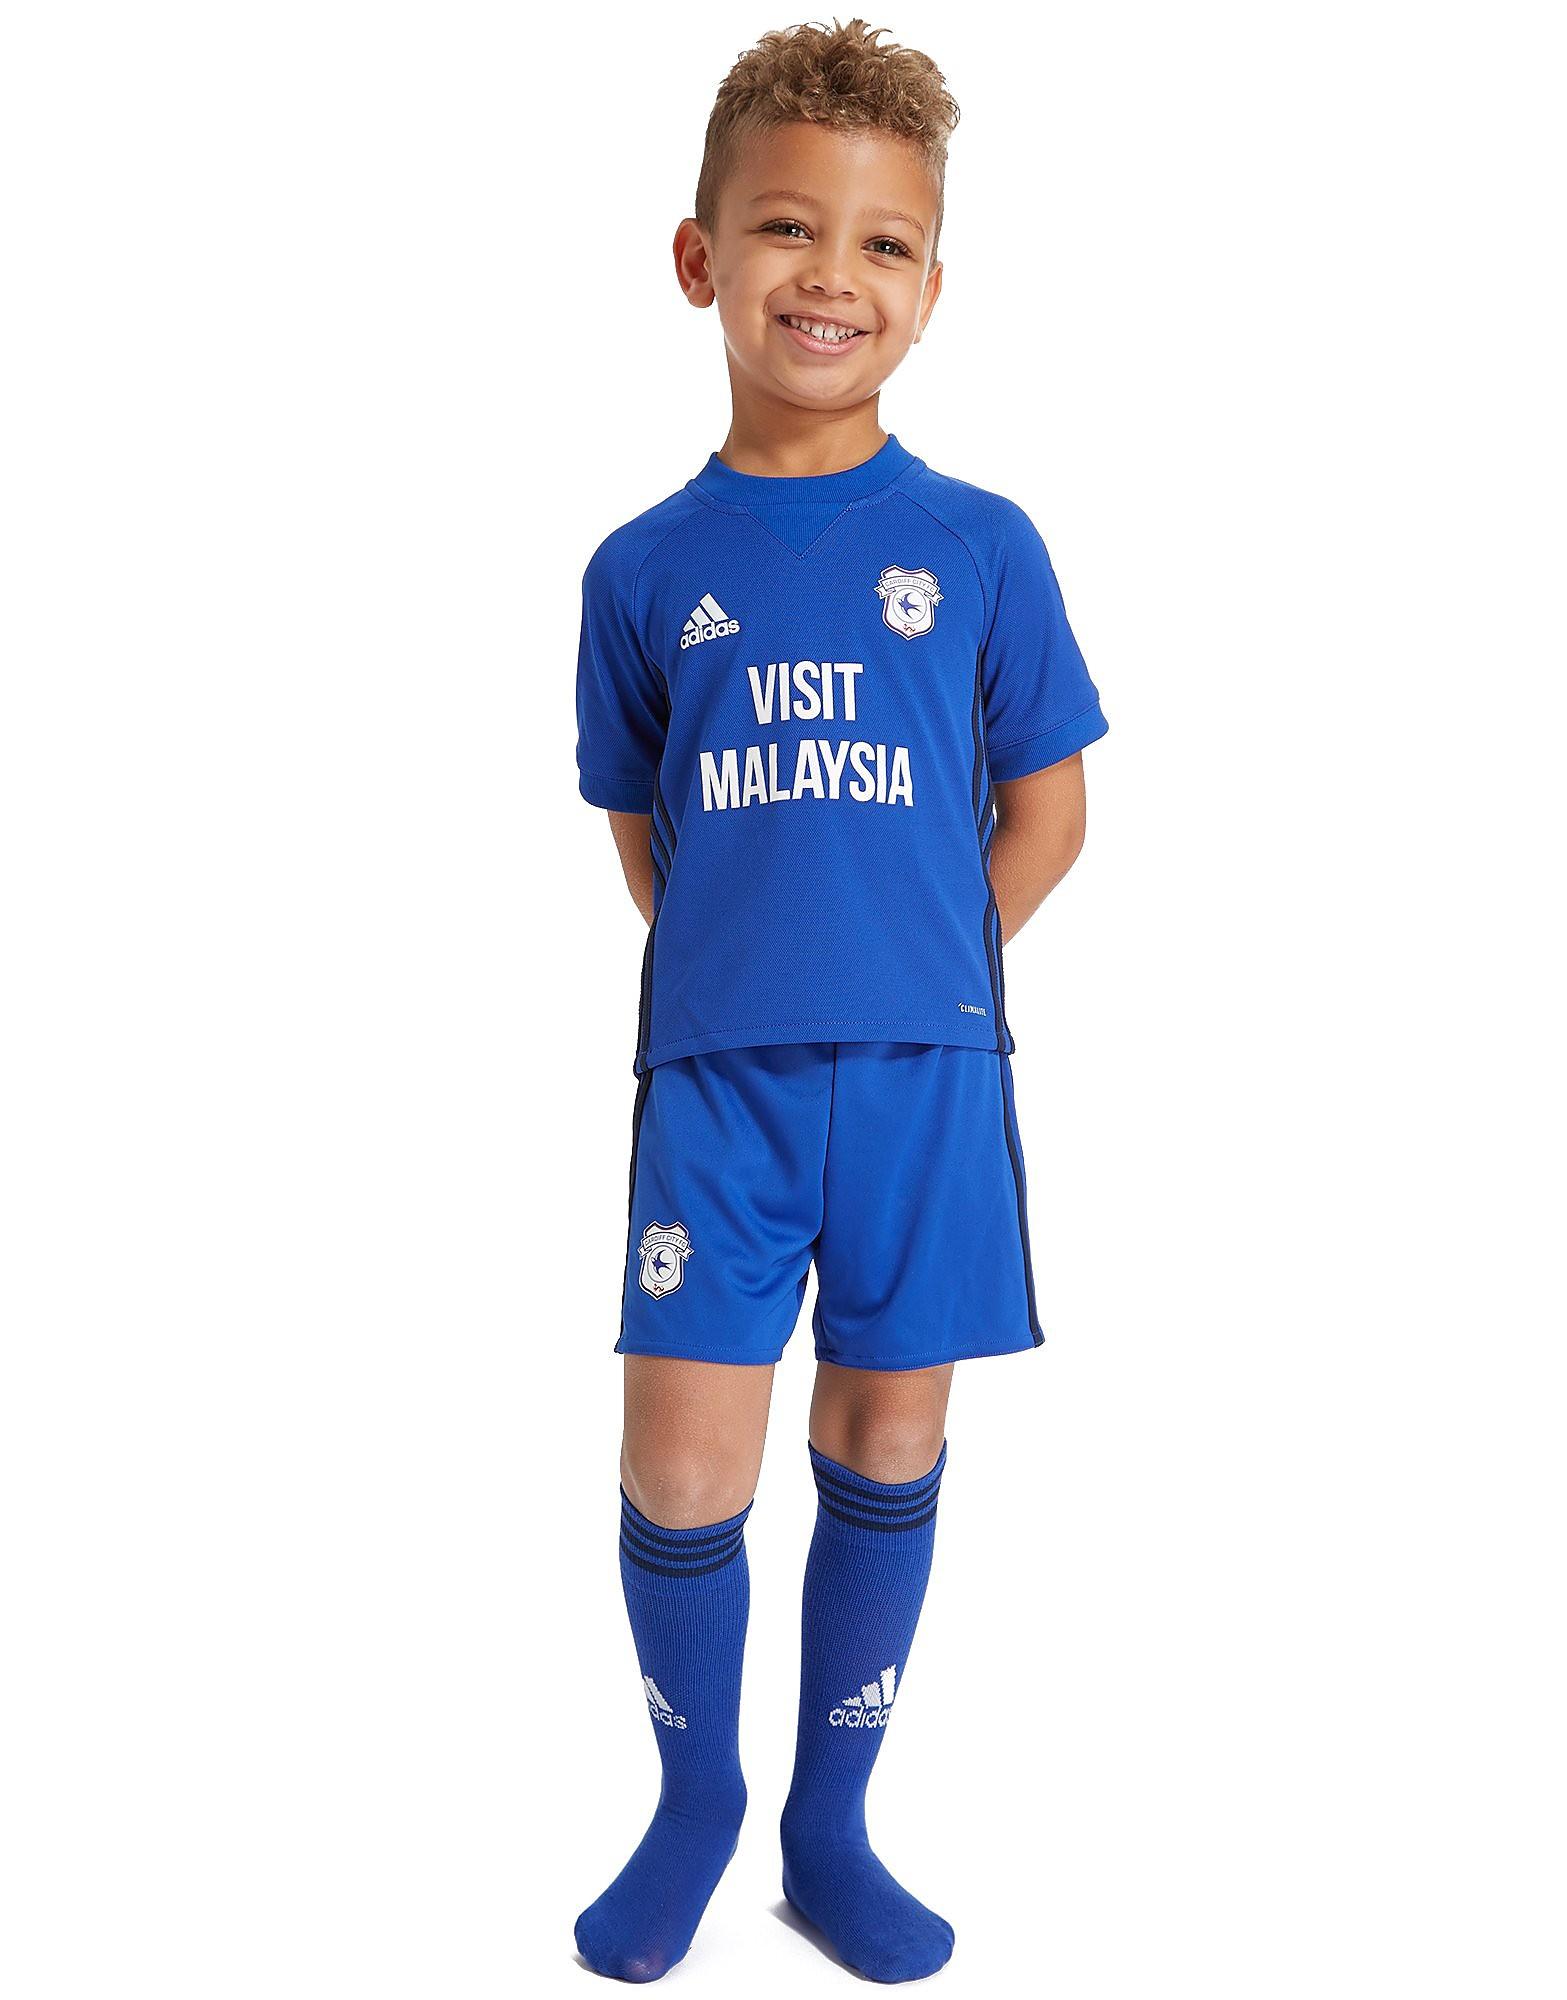 Image de adidas adidas Cardiff City 2017/18 Home Kit Enfants - Blue, Blue